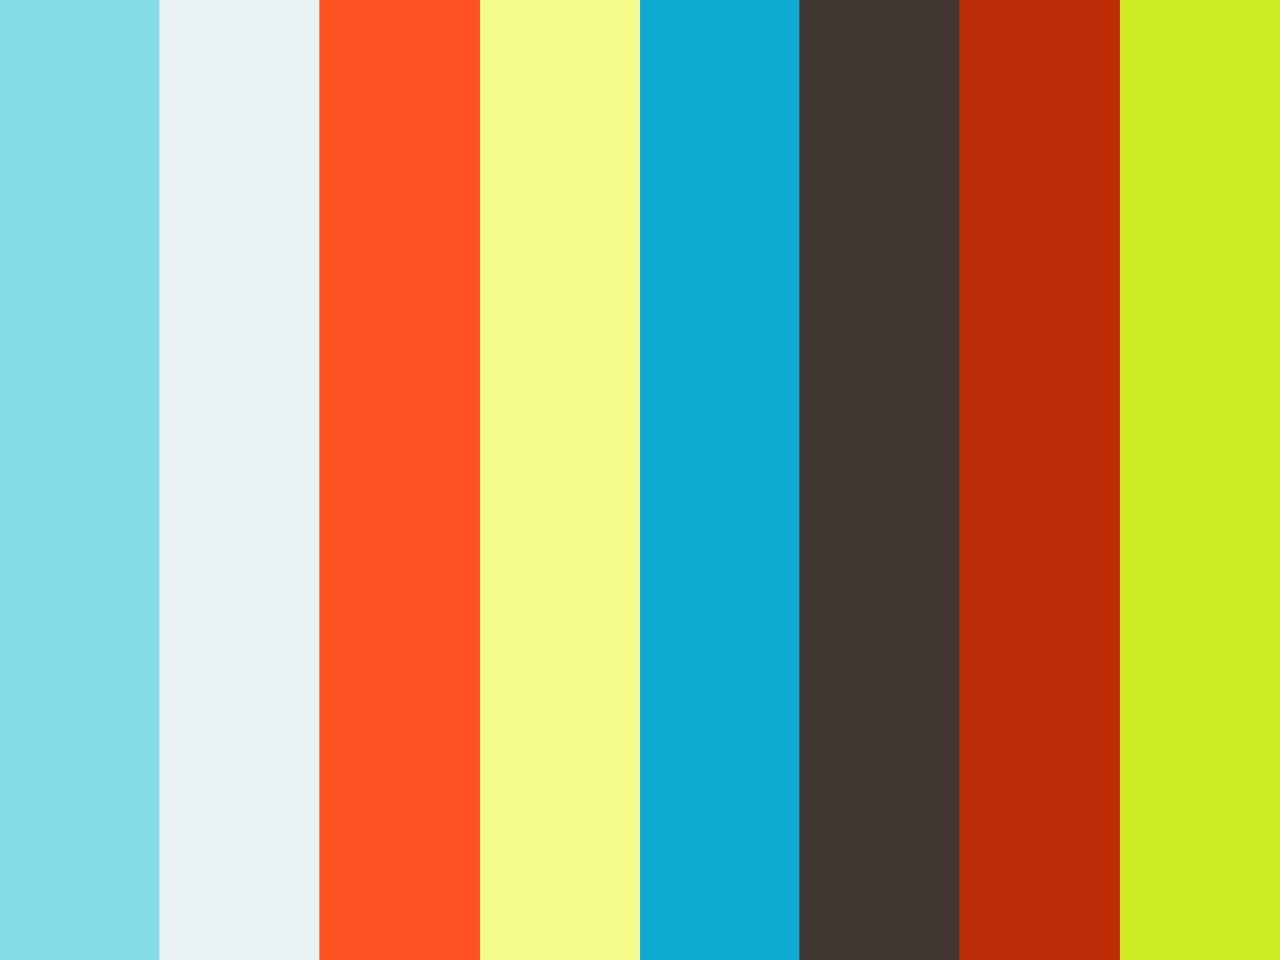 AE 080626 Dingbat Variations